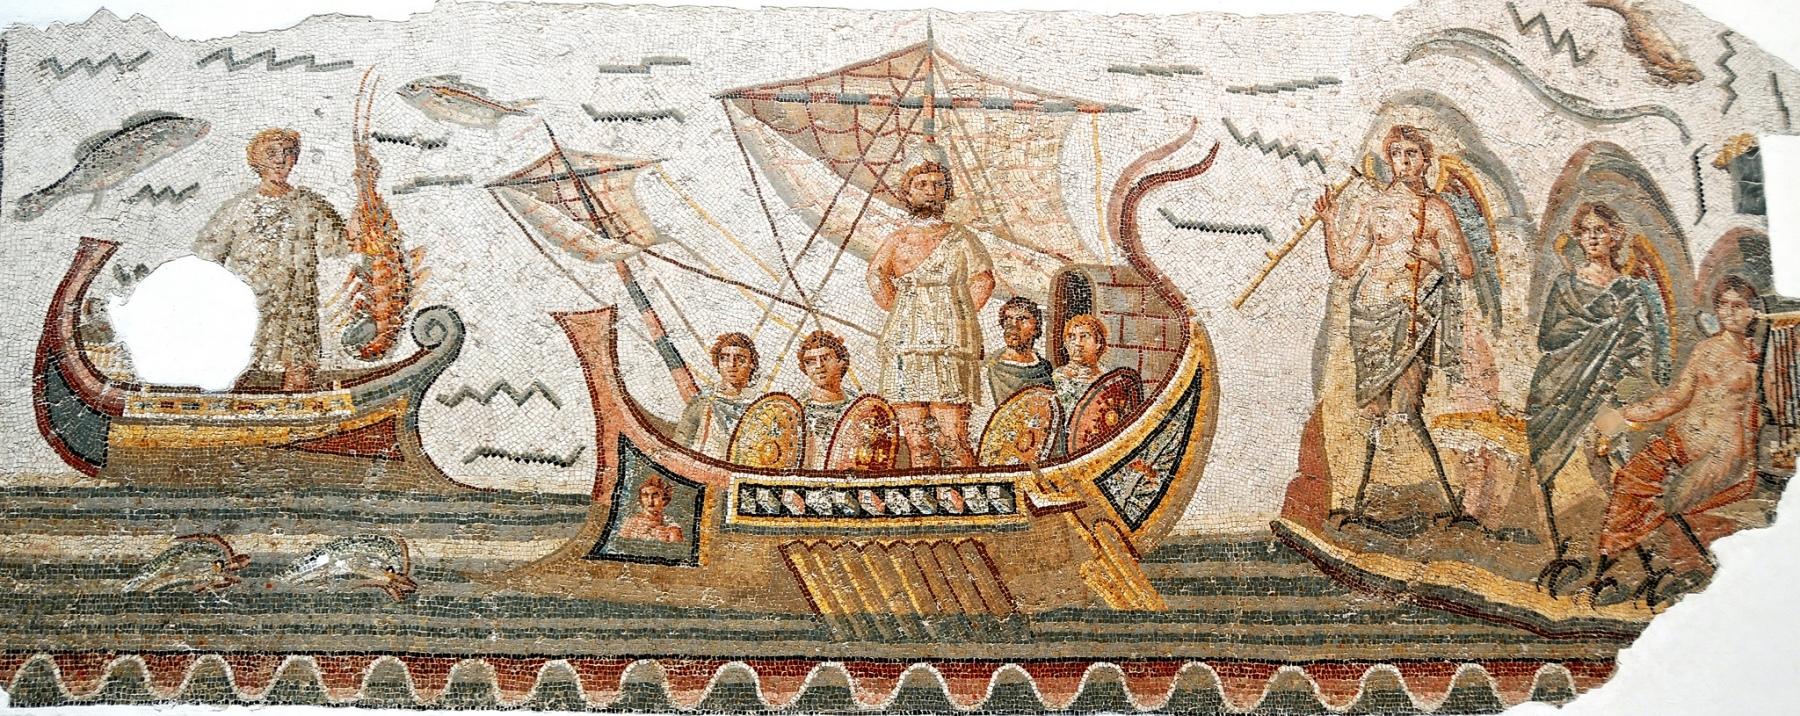 Mozaika plavby Odysea z města Dougga